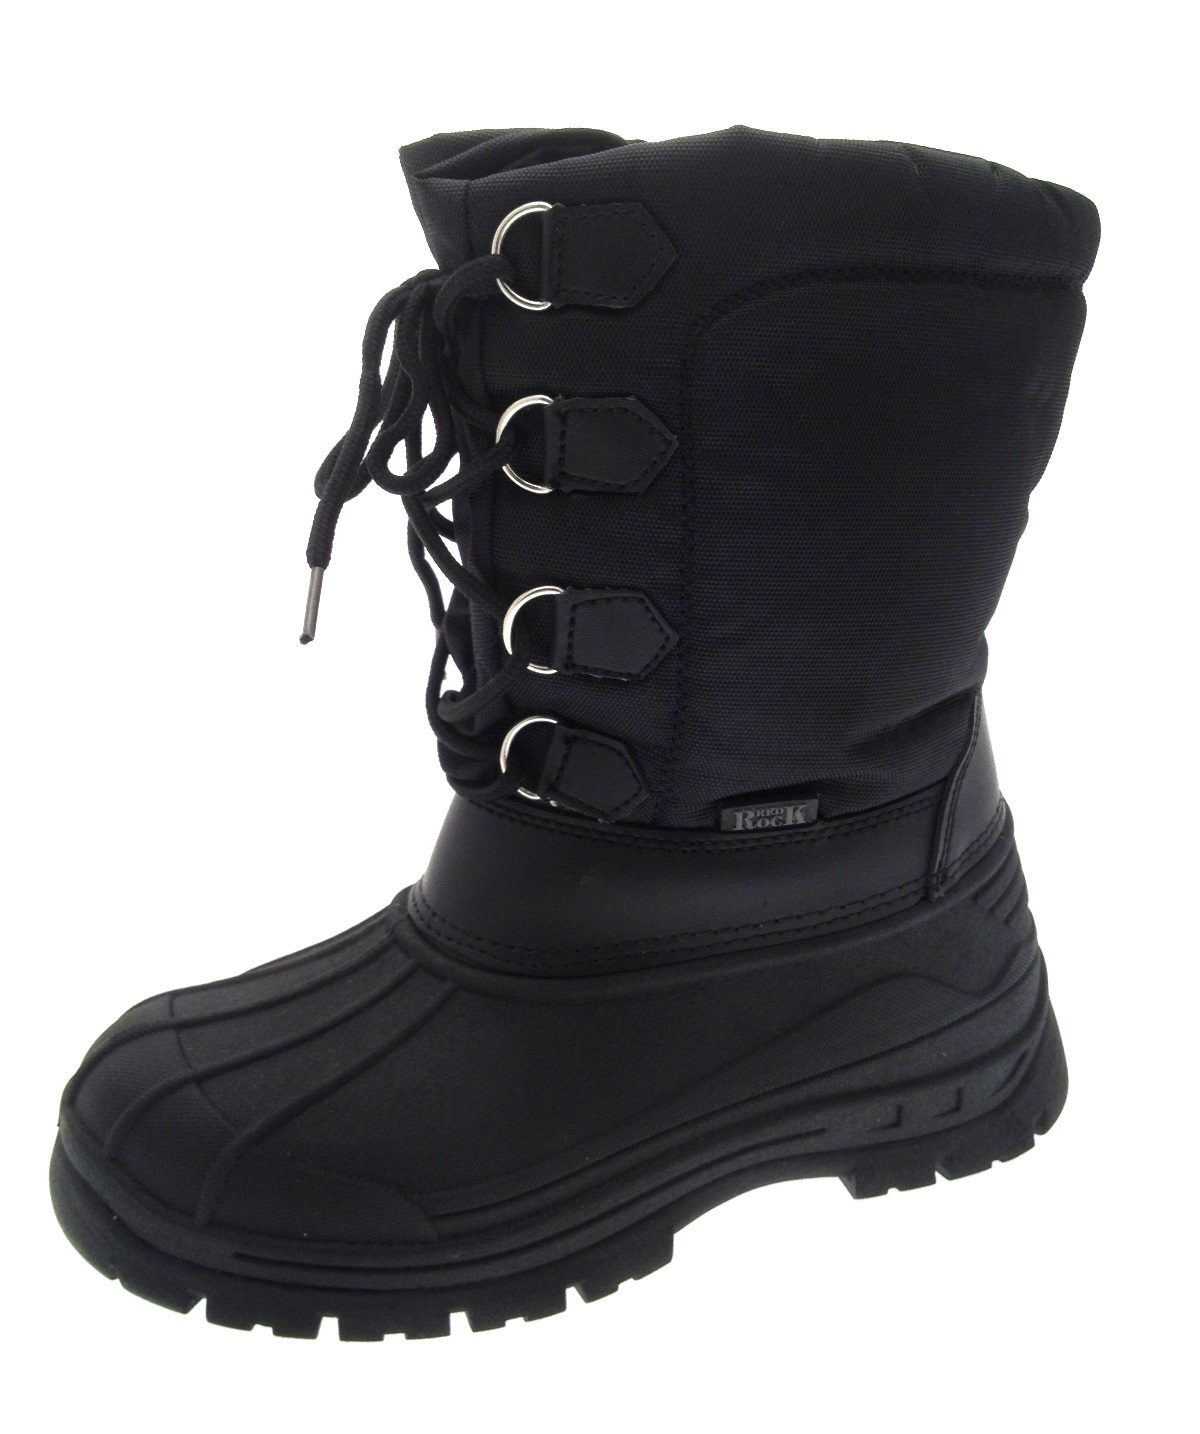 Kids Girls Boys Ladies Waterproof Sole Snow Boots Mucker ...